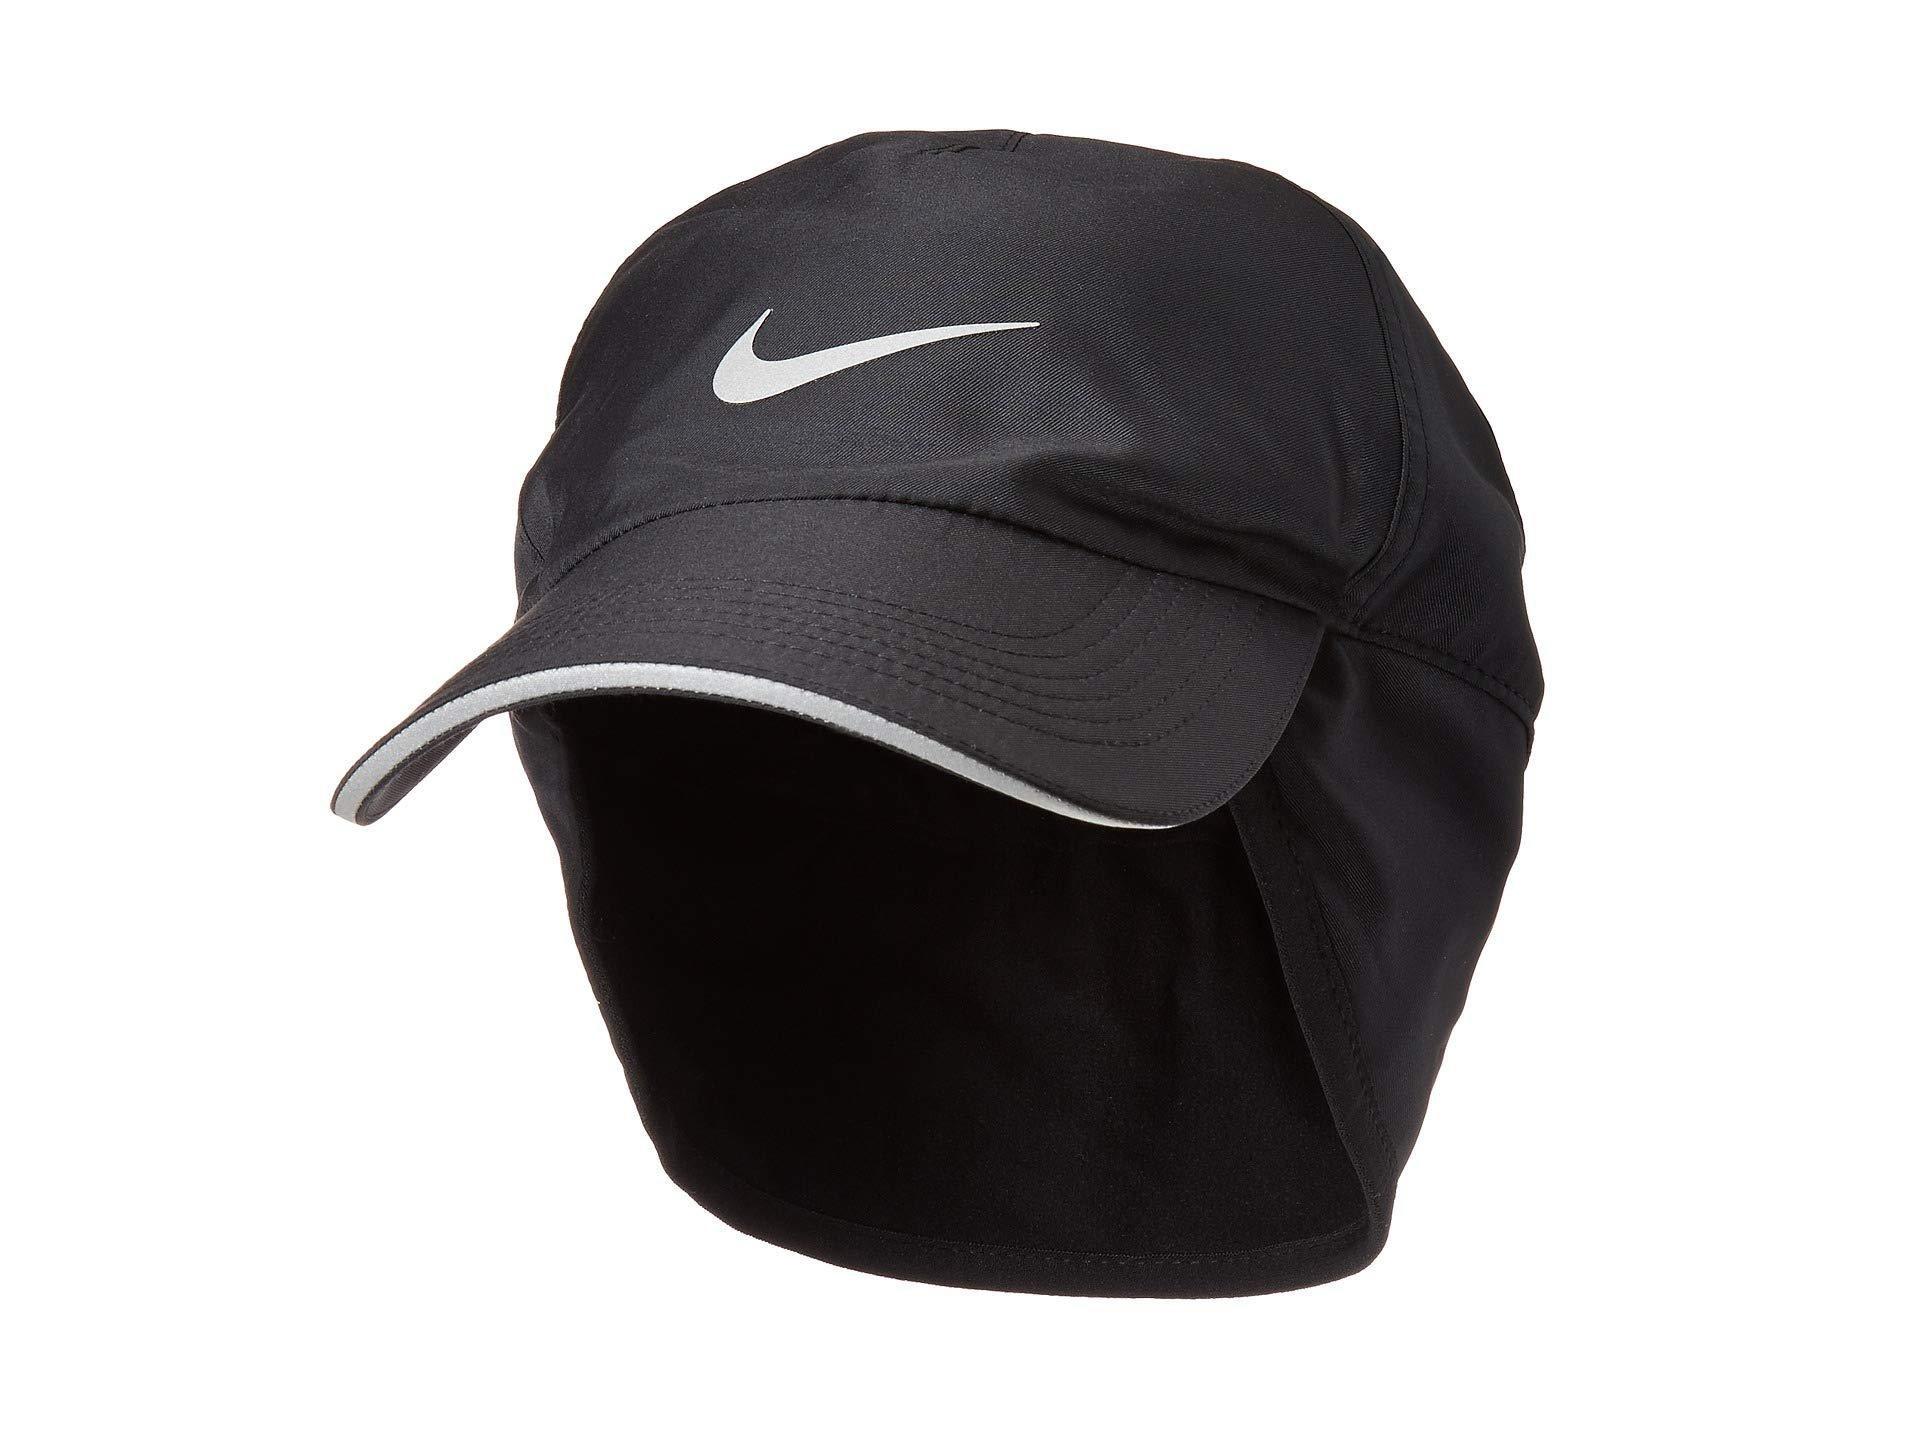 43291e956ac Lyst - Nike H86 Arobill Earflap Cap (black black) Caps in Black for Men